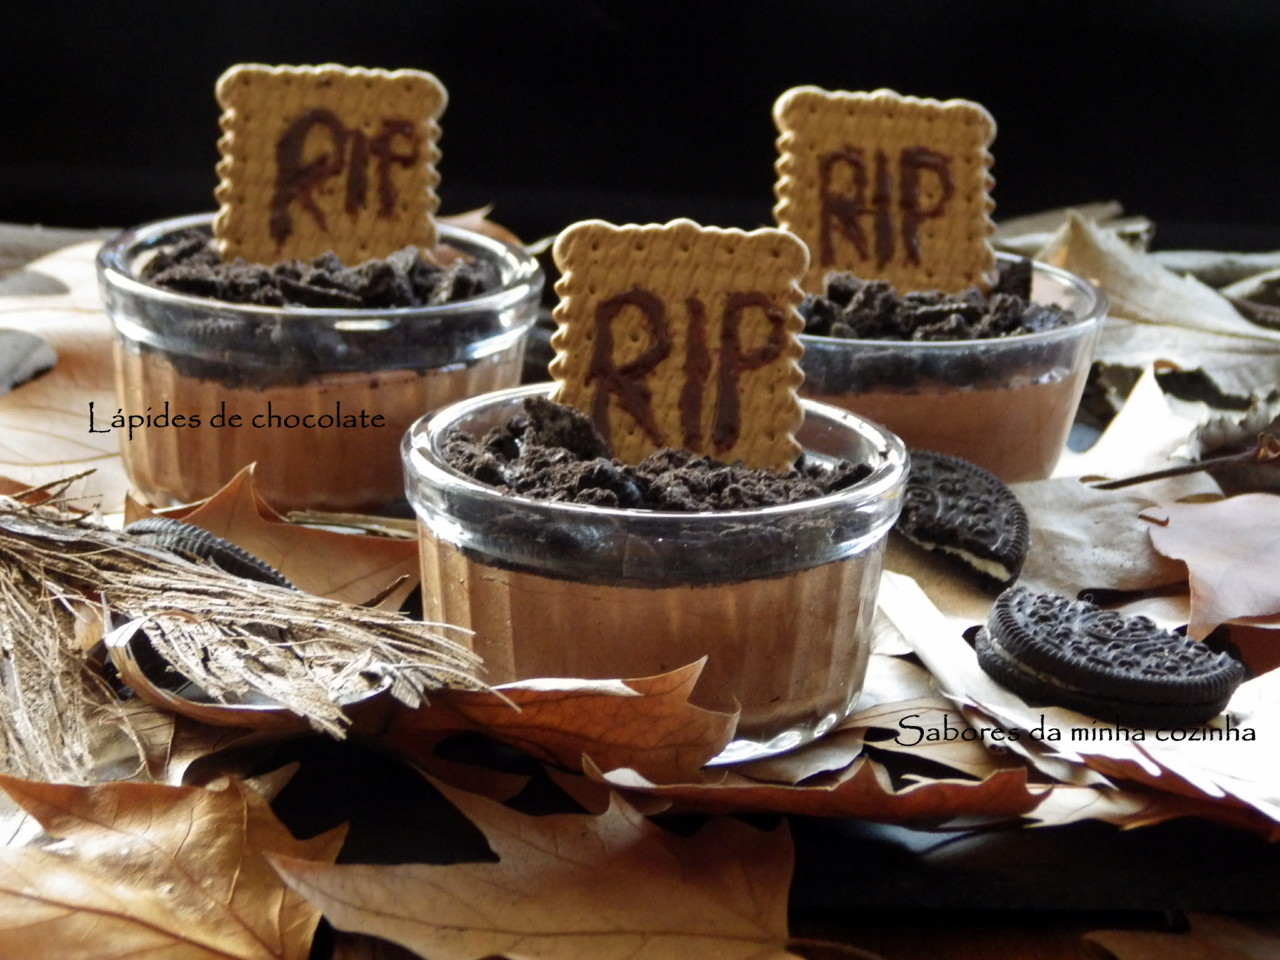 IMGP8251-Lápides de chocolate-Blog.JPG